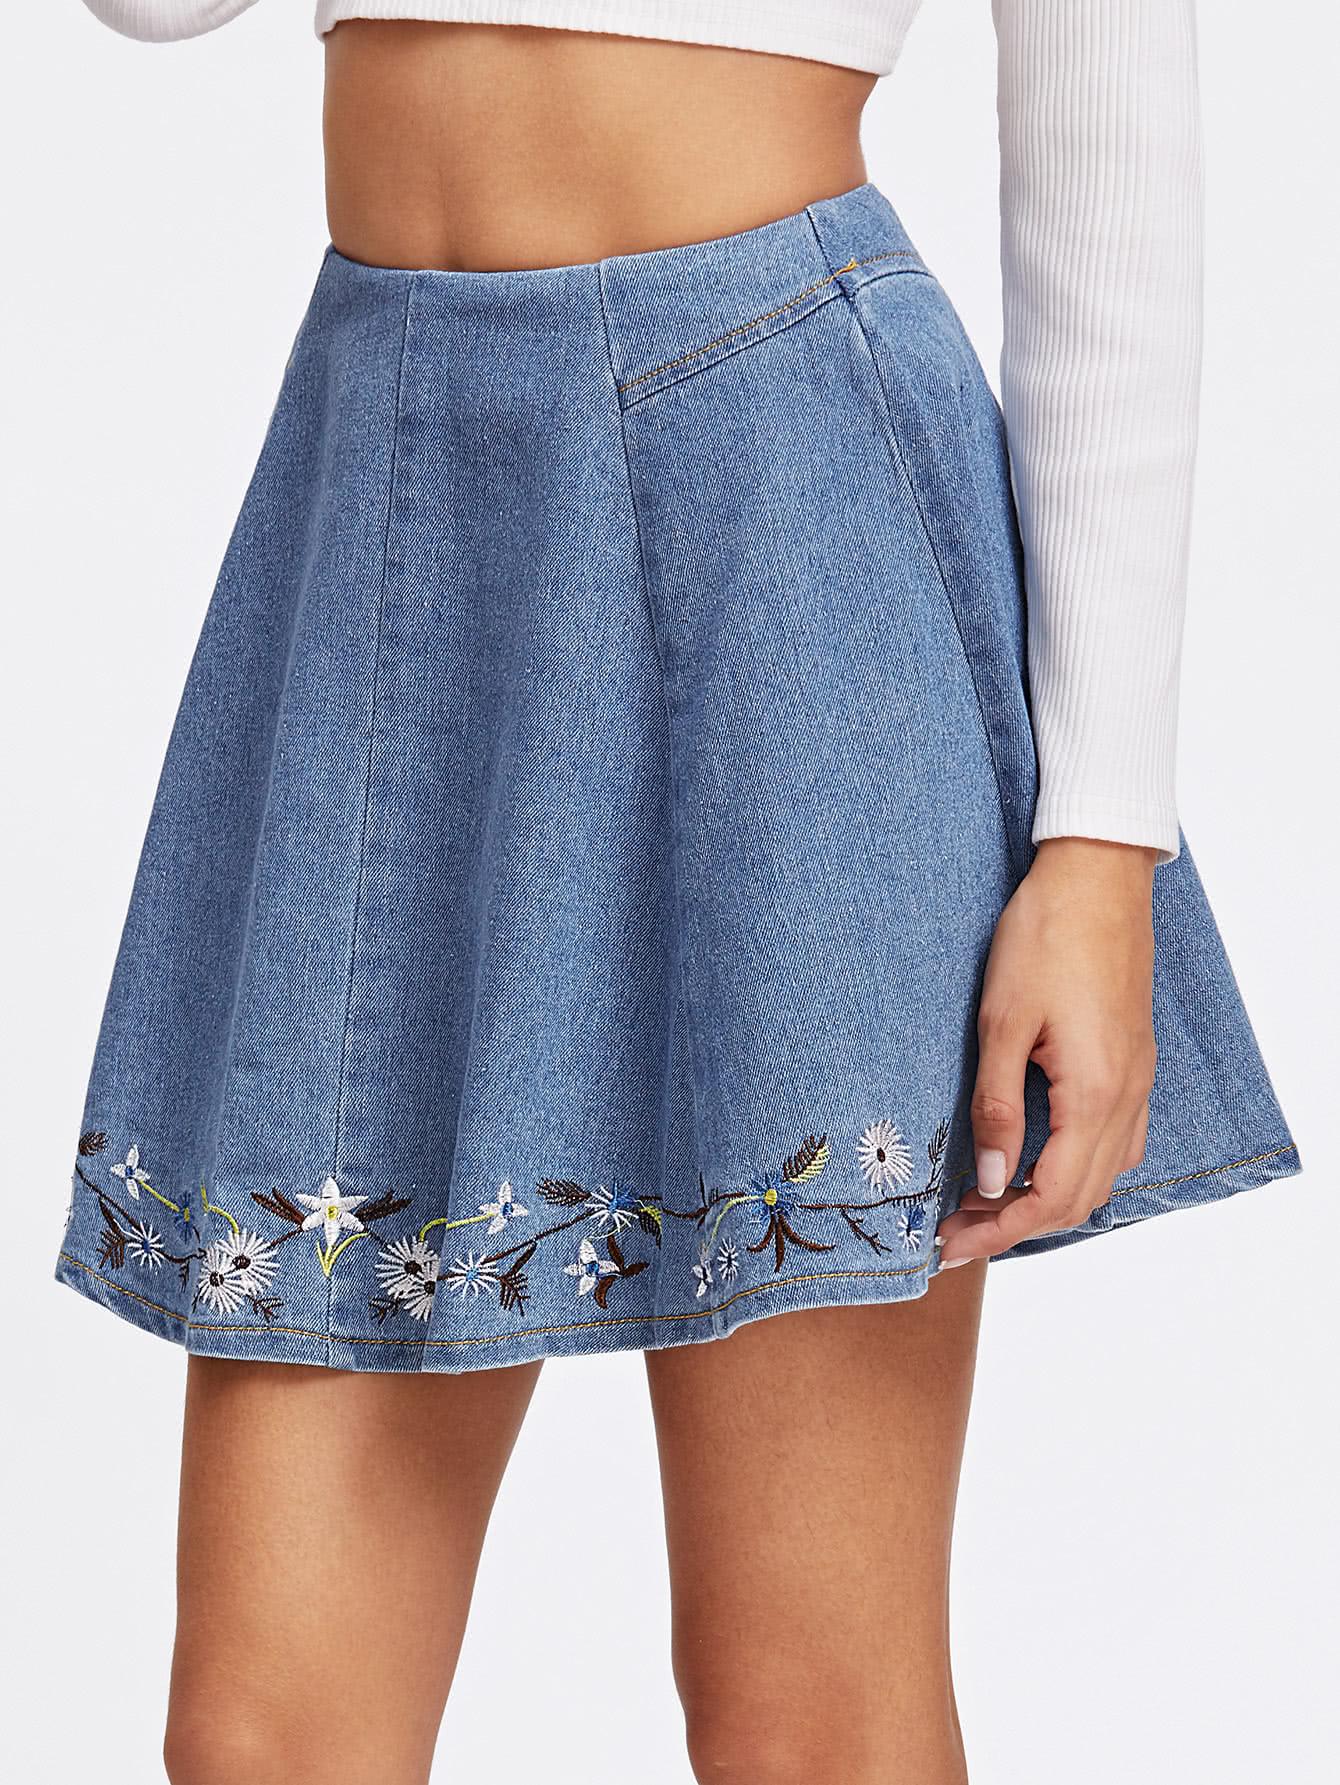 Botanical Embroidered Denim Box Pleated Skirt